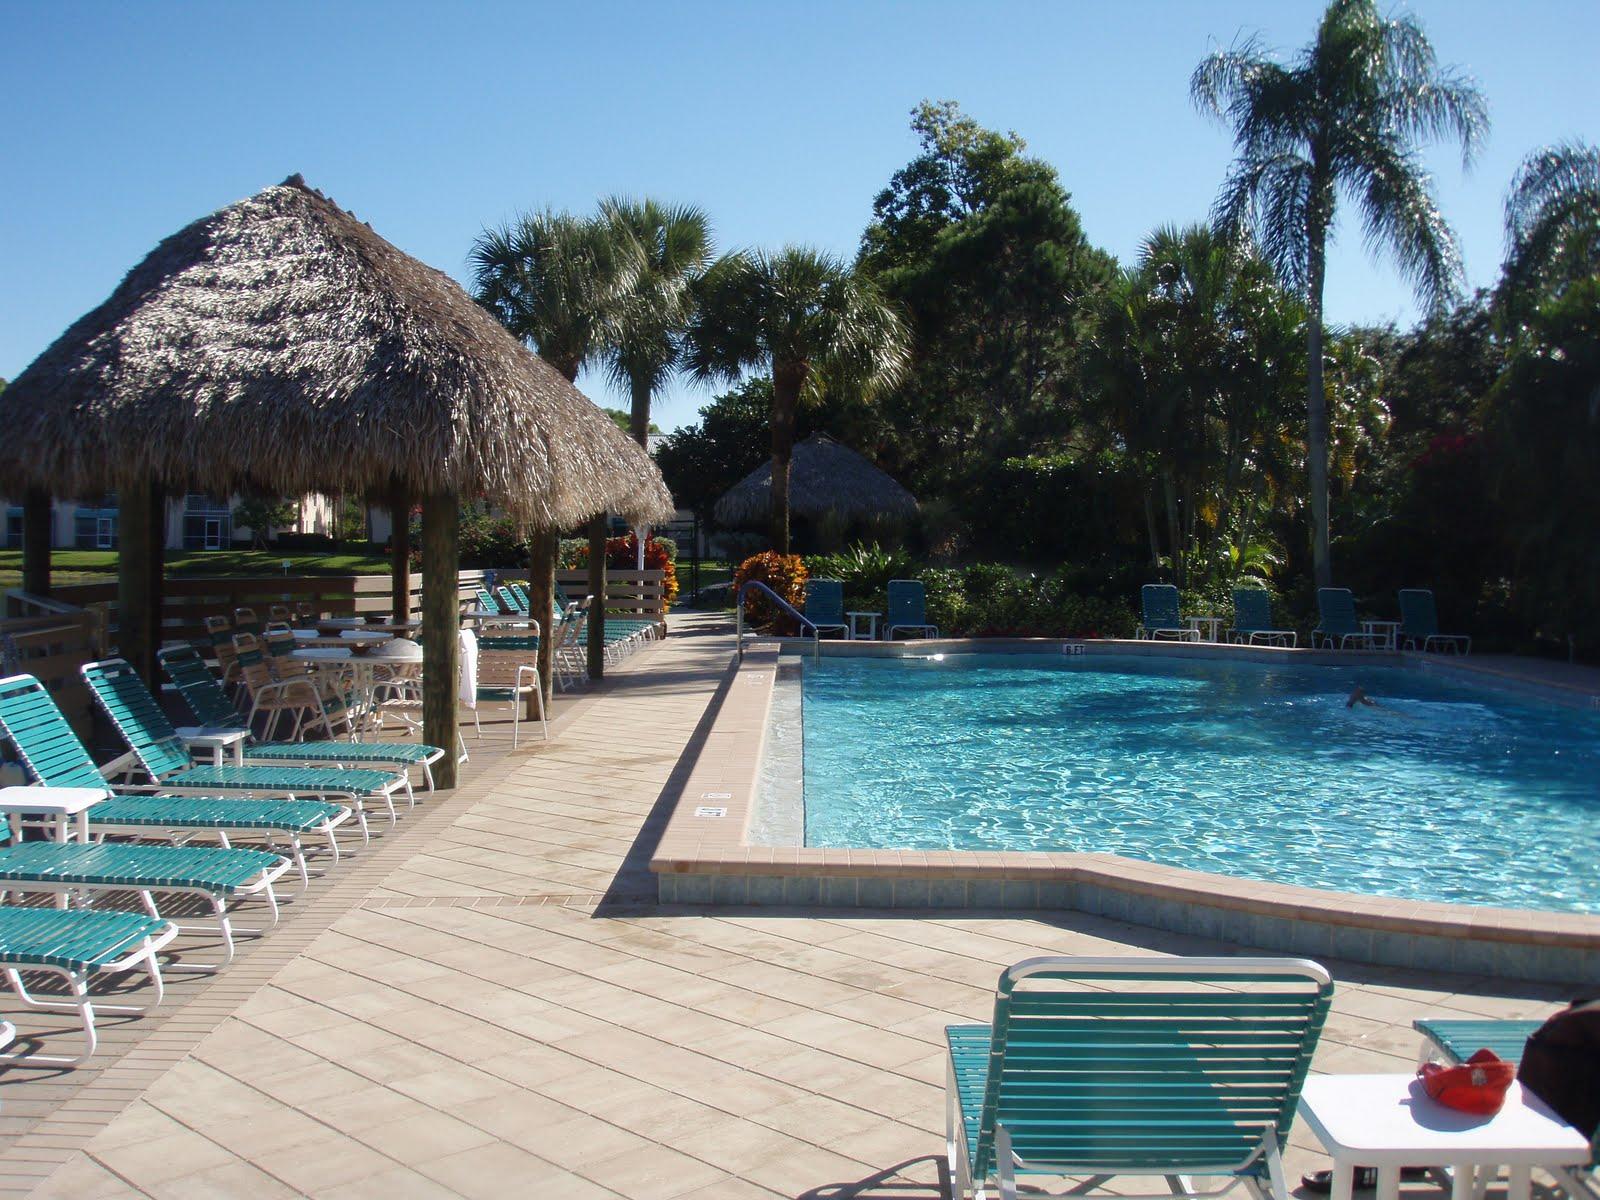 Rent in naples fl pavilion club in naples florida for Public swimming pools in naples florida